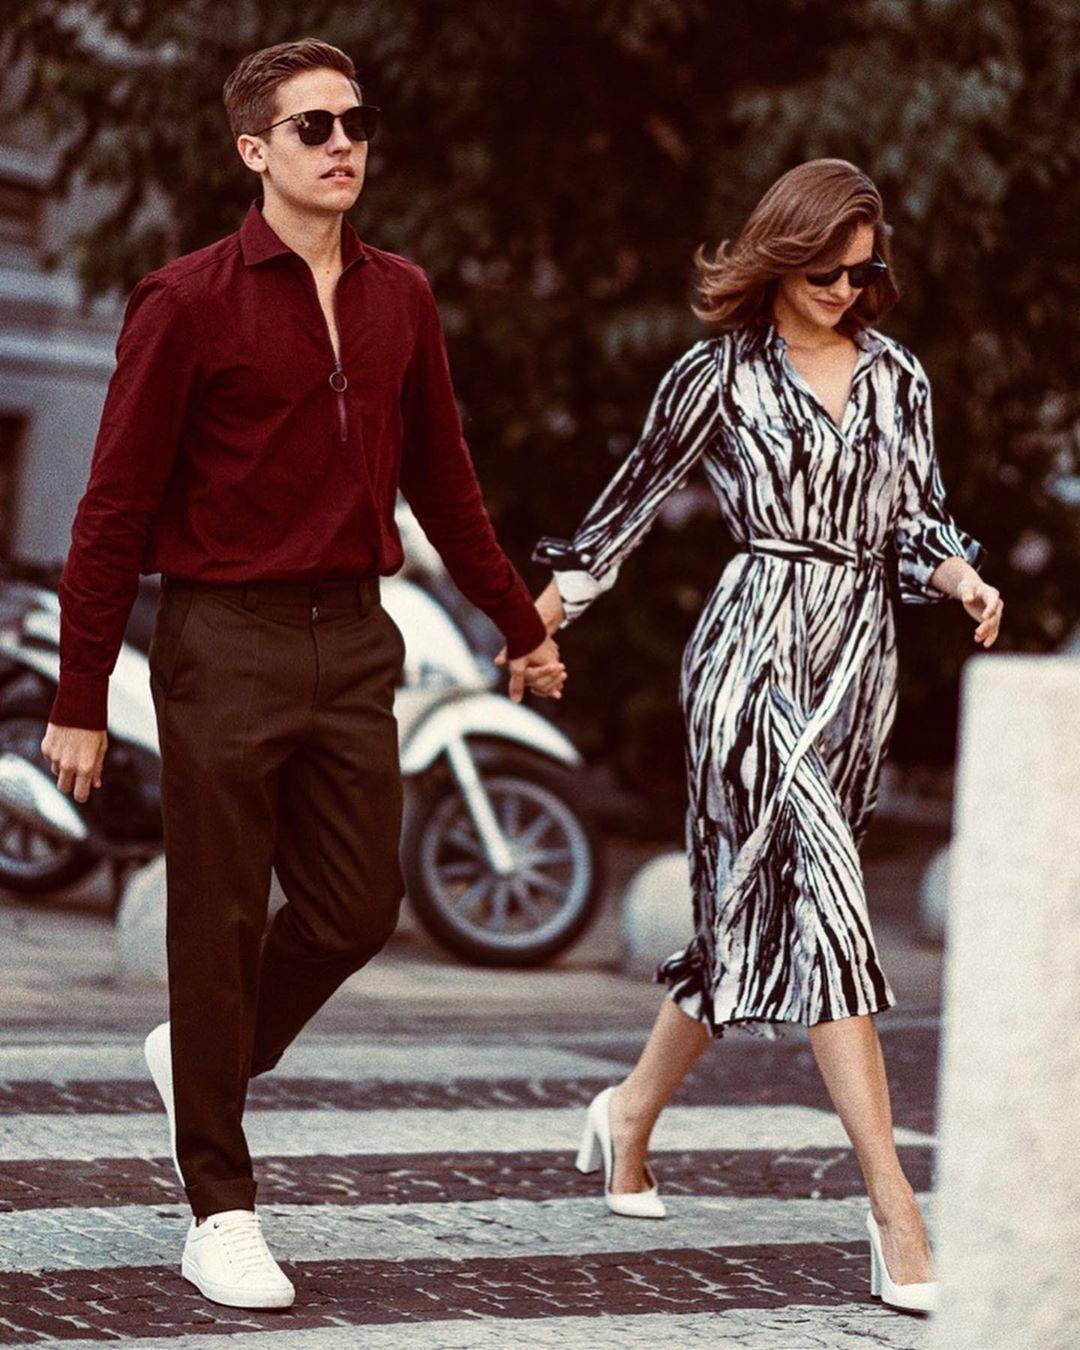 Fabulous Style Barbara Palvin Photo Insta